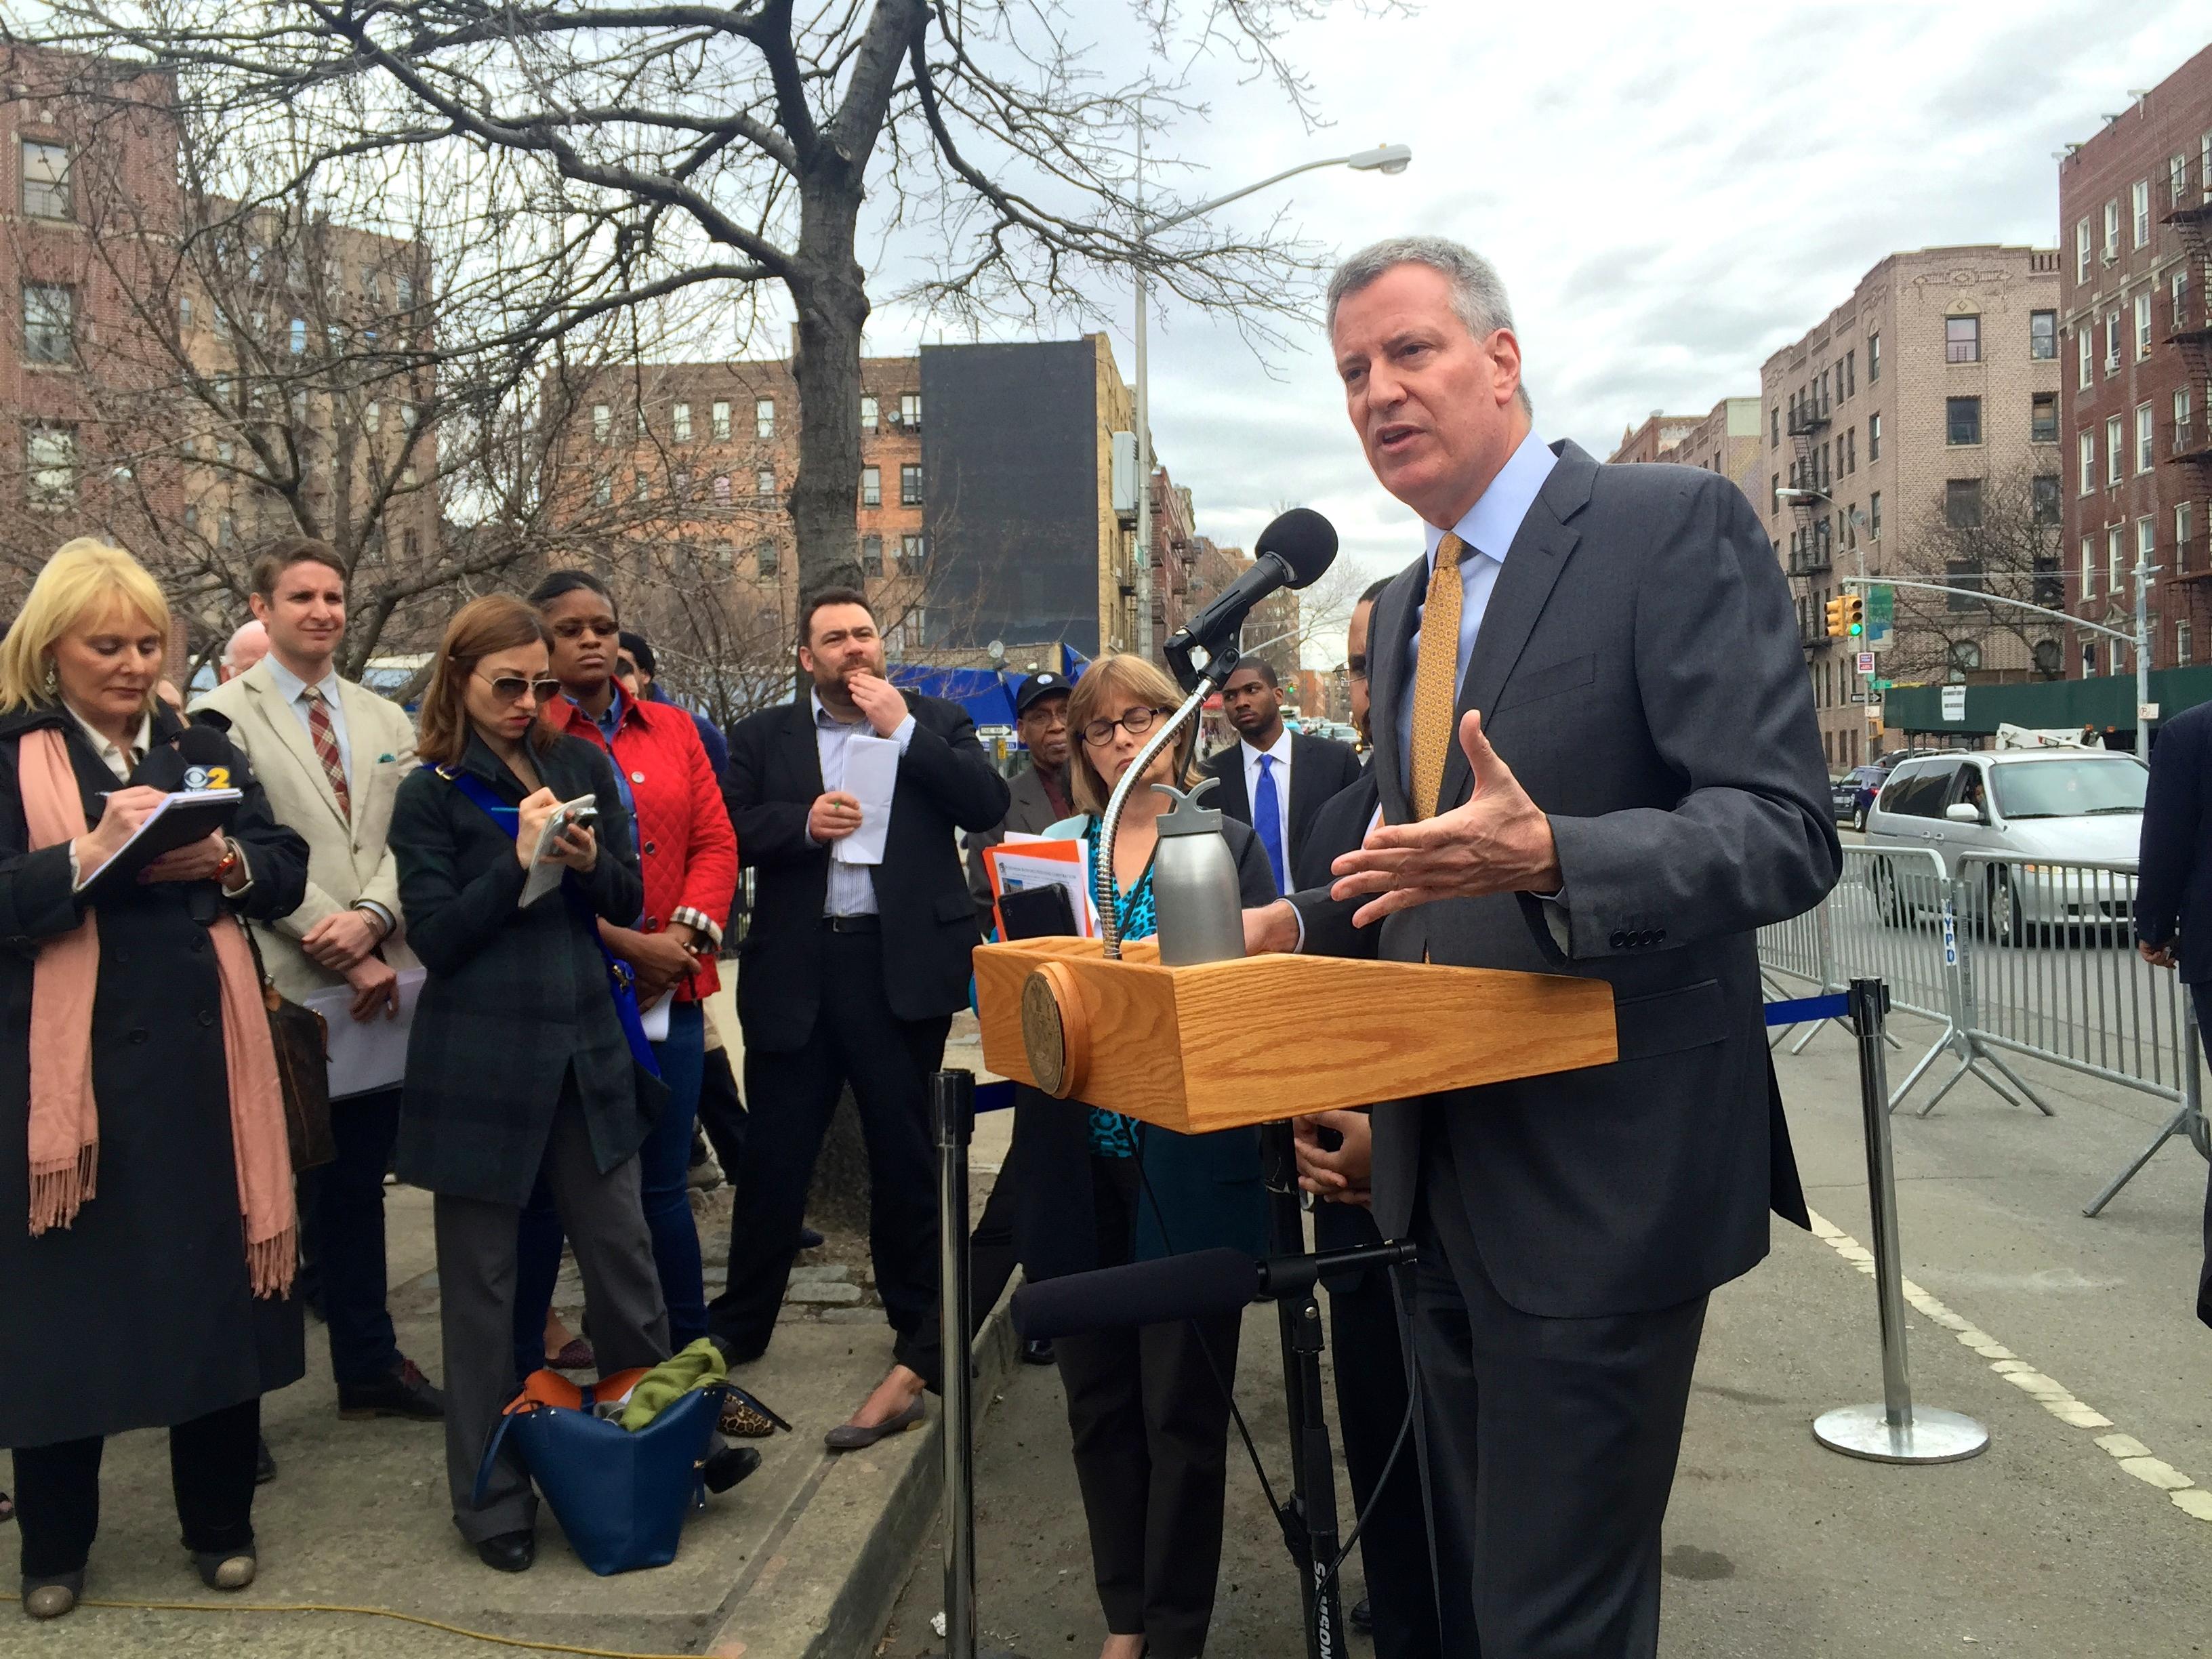 Mayor Bill de Blasio speaks about Hillary Clinton this afternoon. (Photo: Jillian Jorgensen/New York Observer)